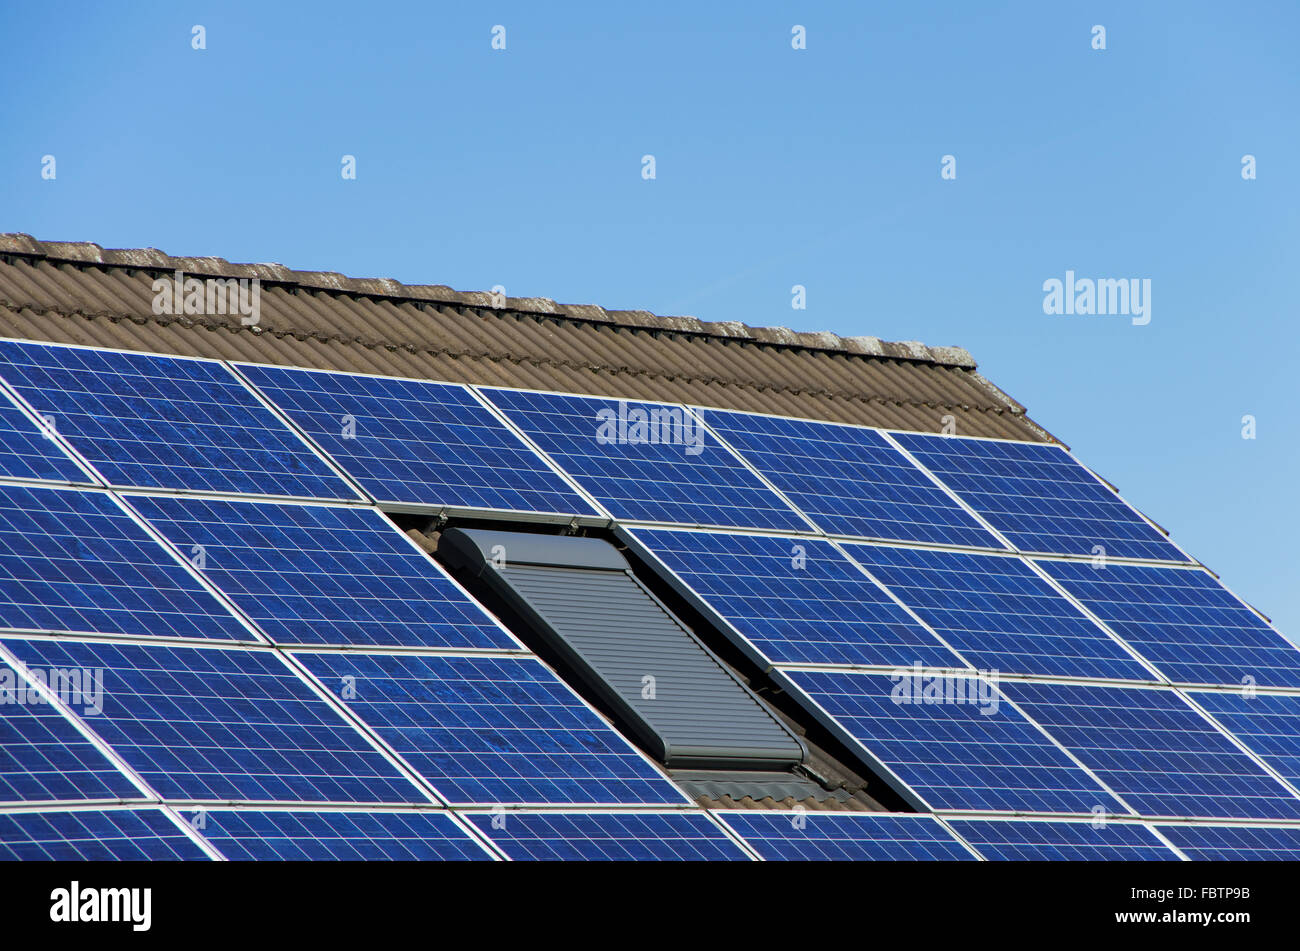 solar power roof - Stock Image